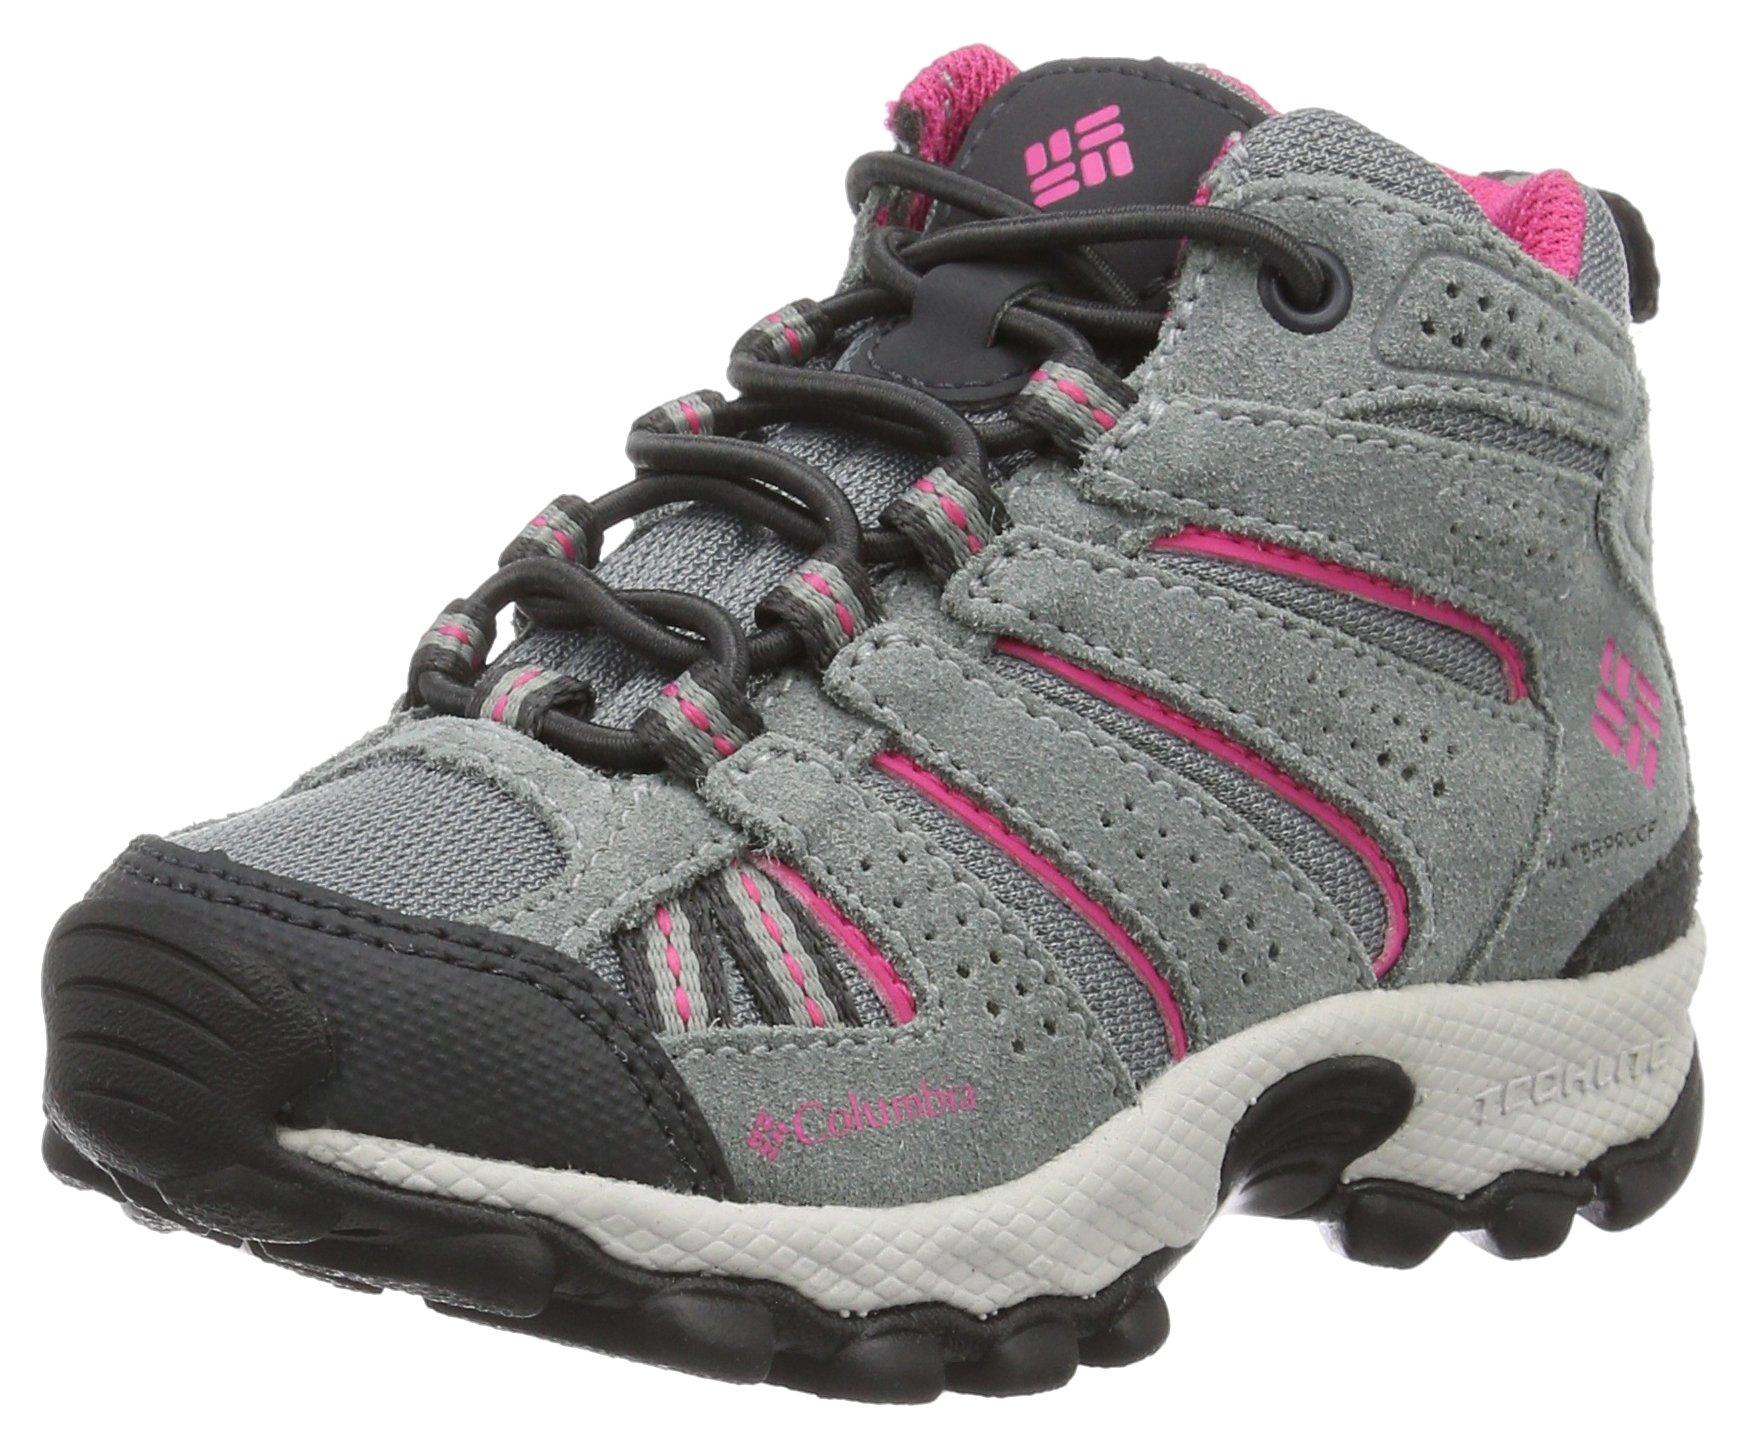 Columbia Kids' Childrens North Plains Mid Waterproof Hiking Boot, Grey Ash/Ultra Pink, 10 M US Little Kid